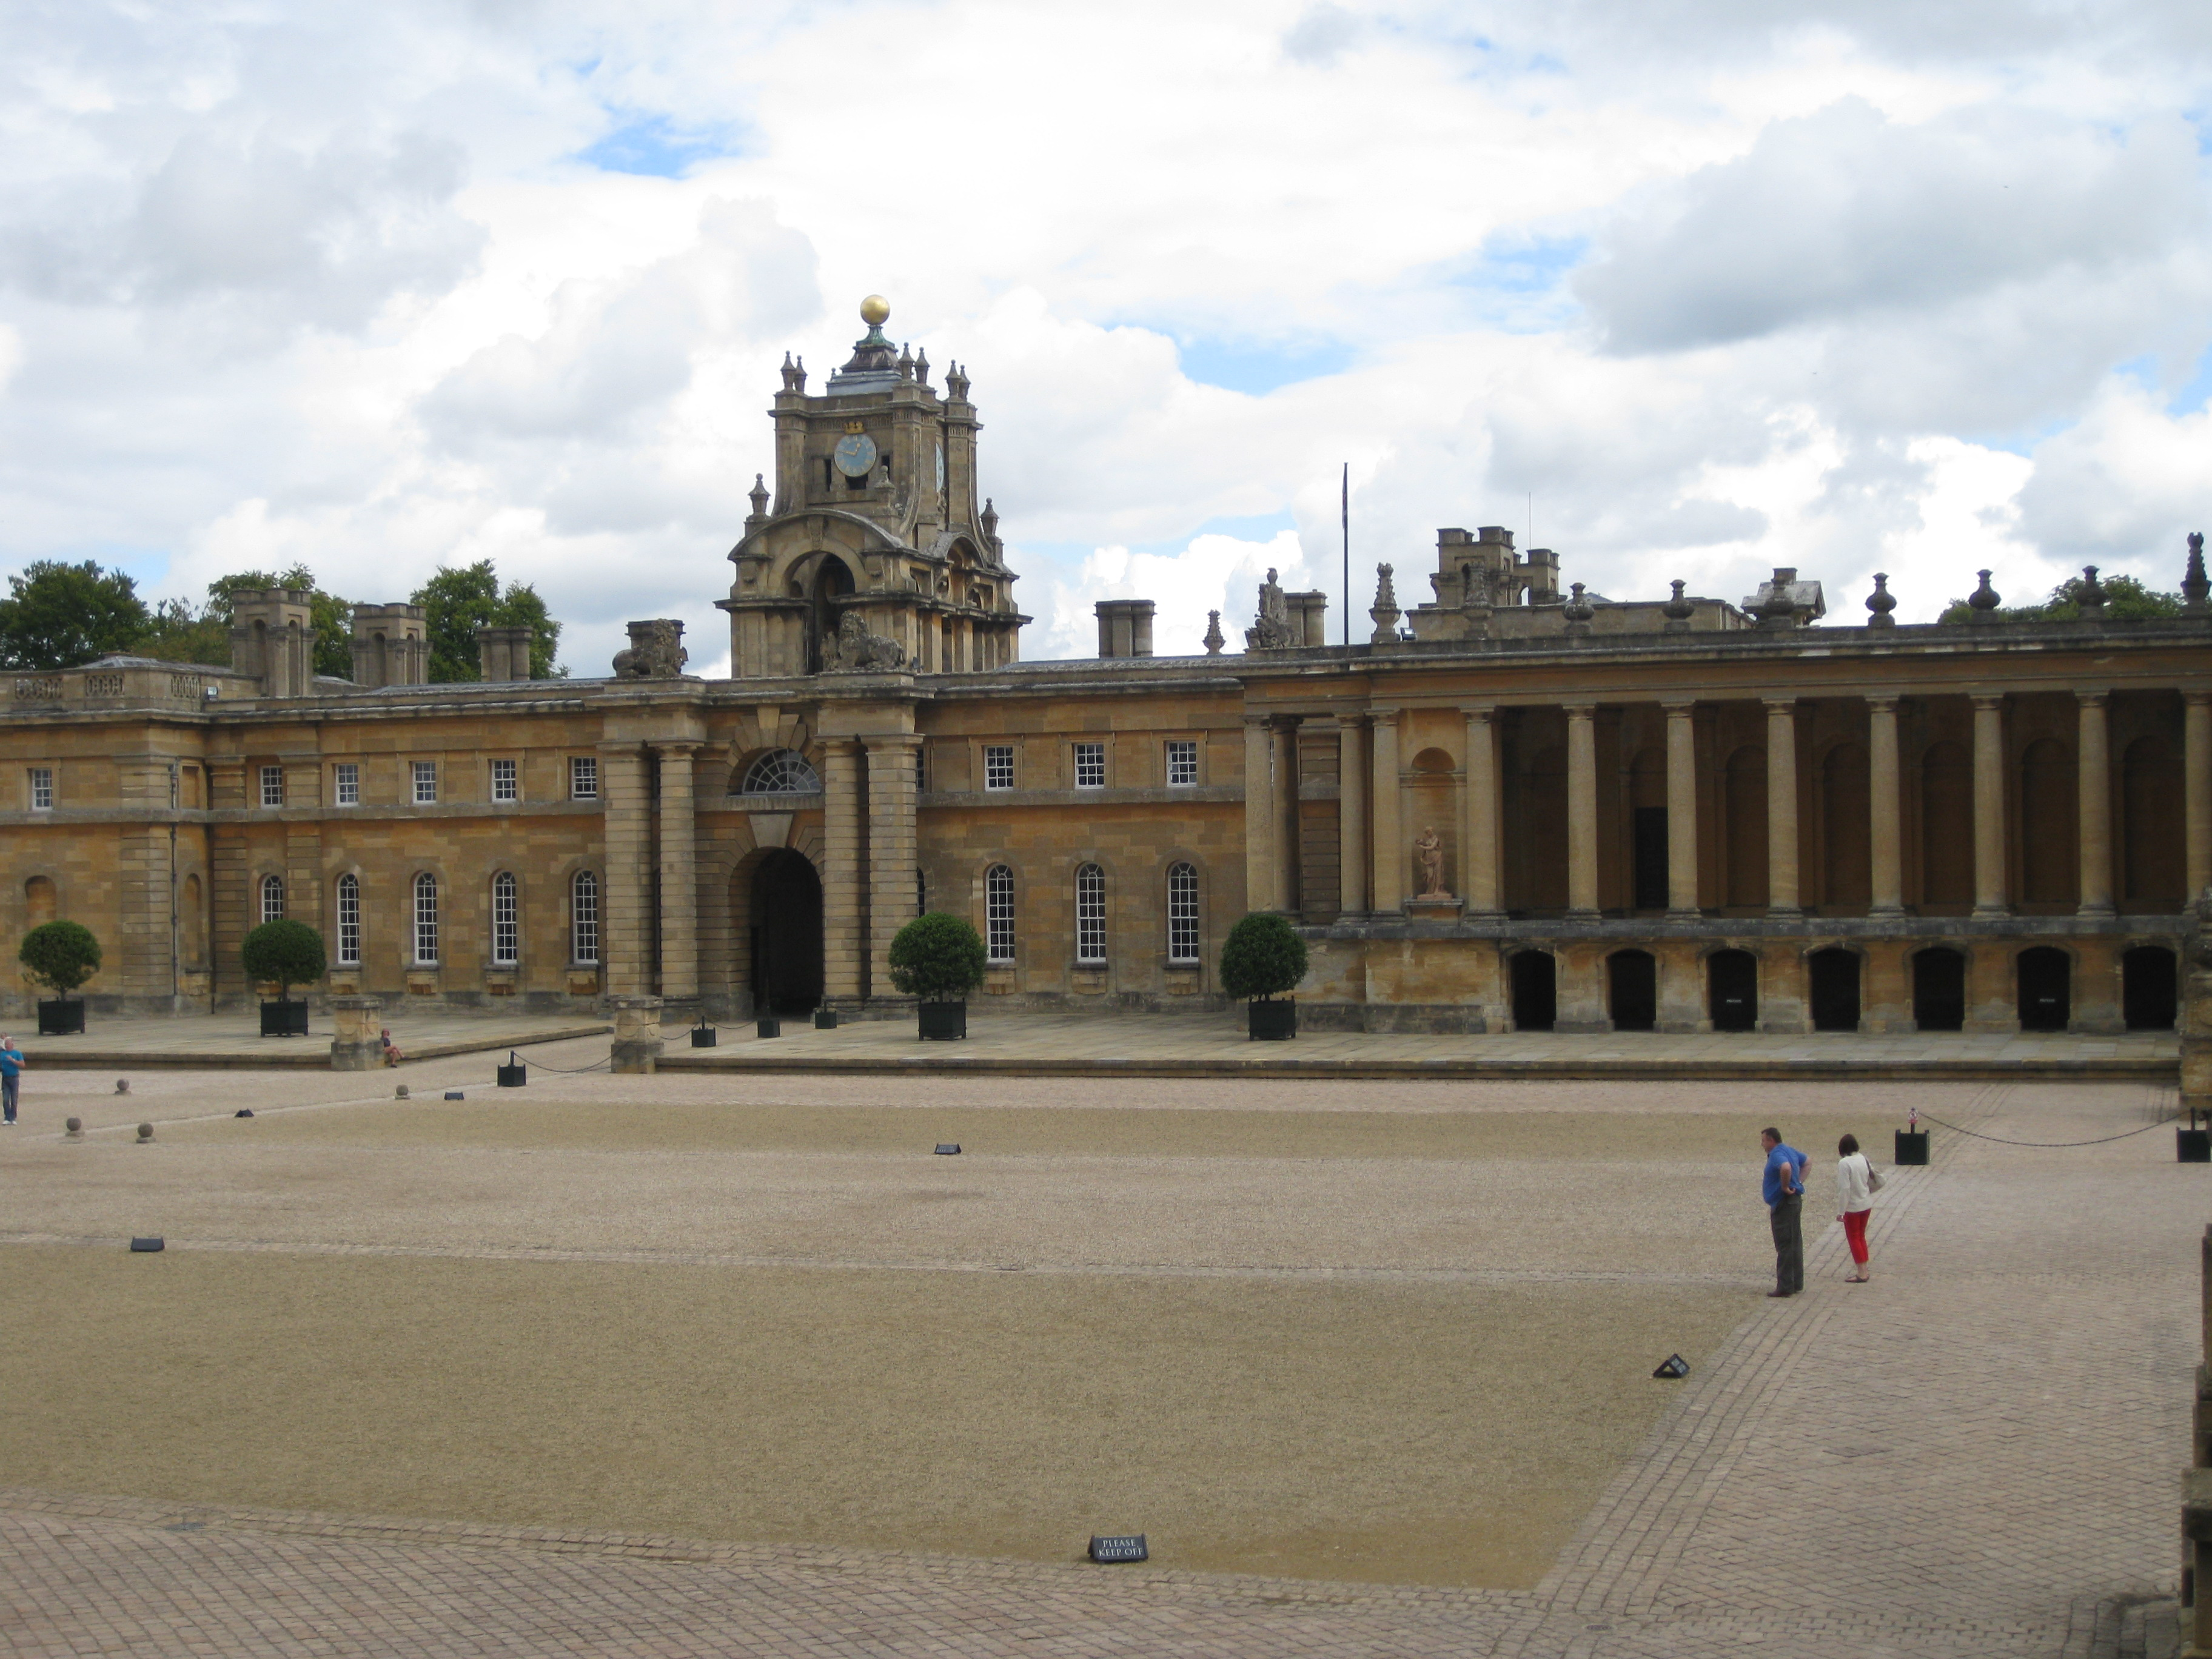 Uncategorized britannica home fashions tencel sheets - Blenheim Palace